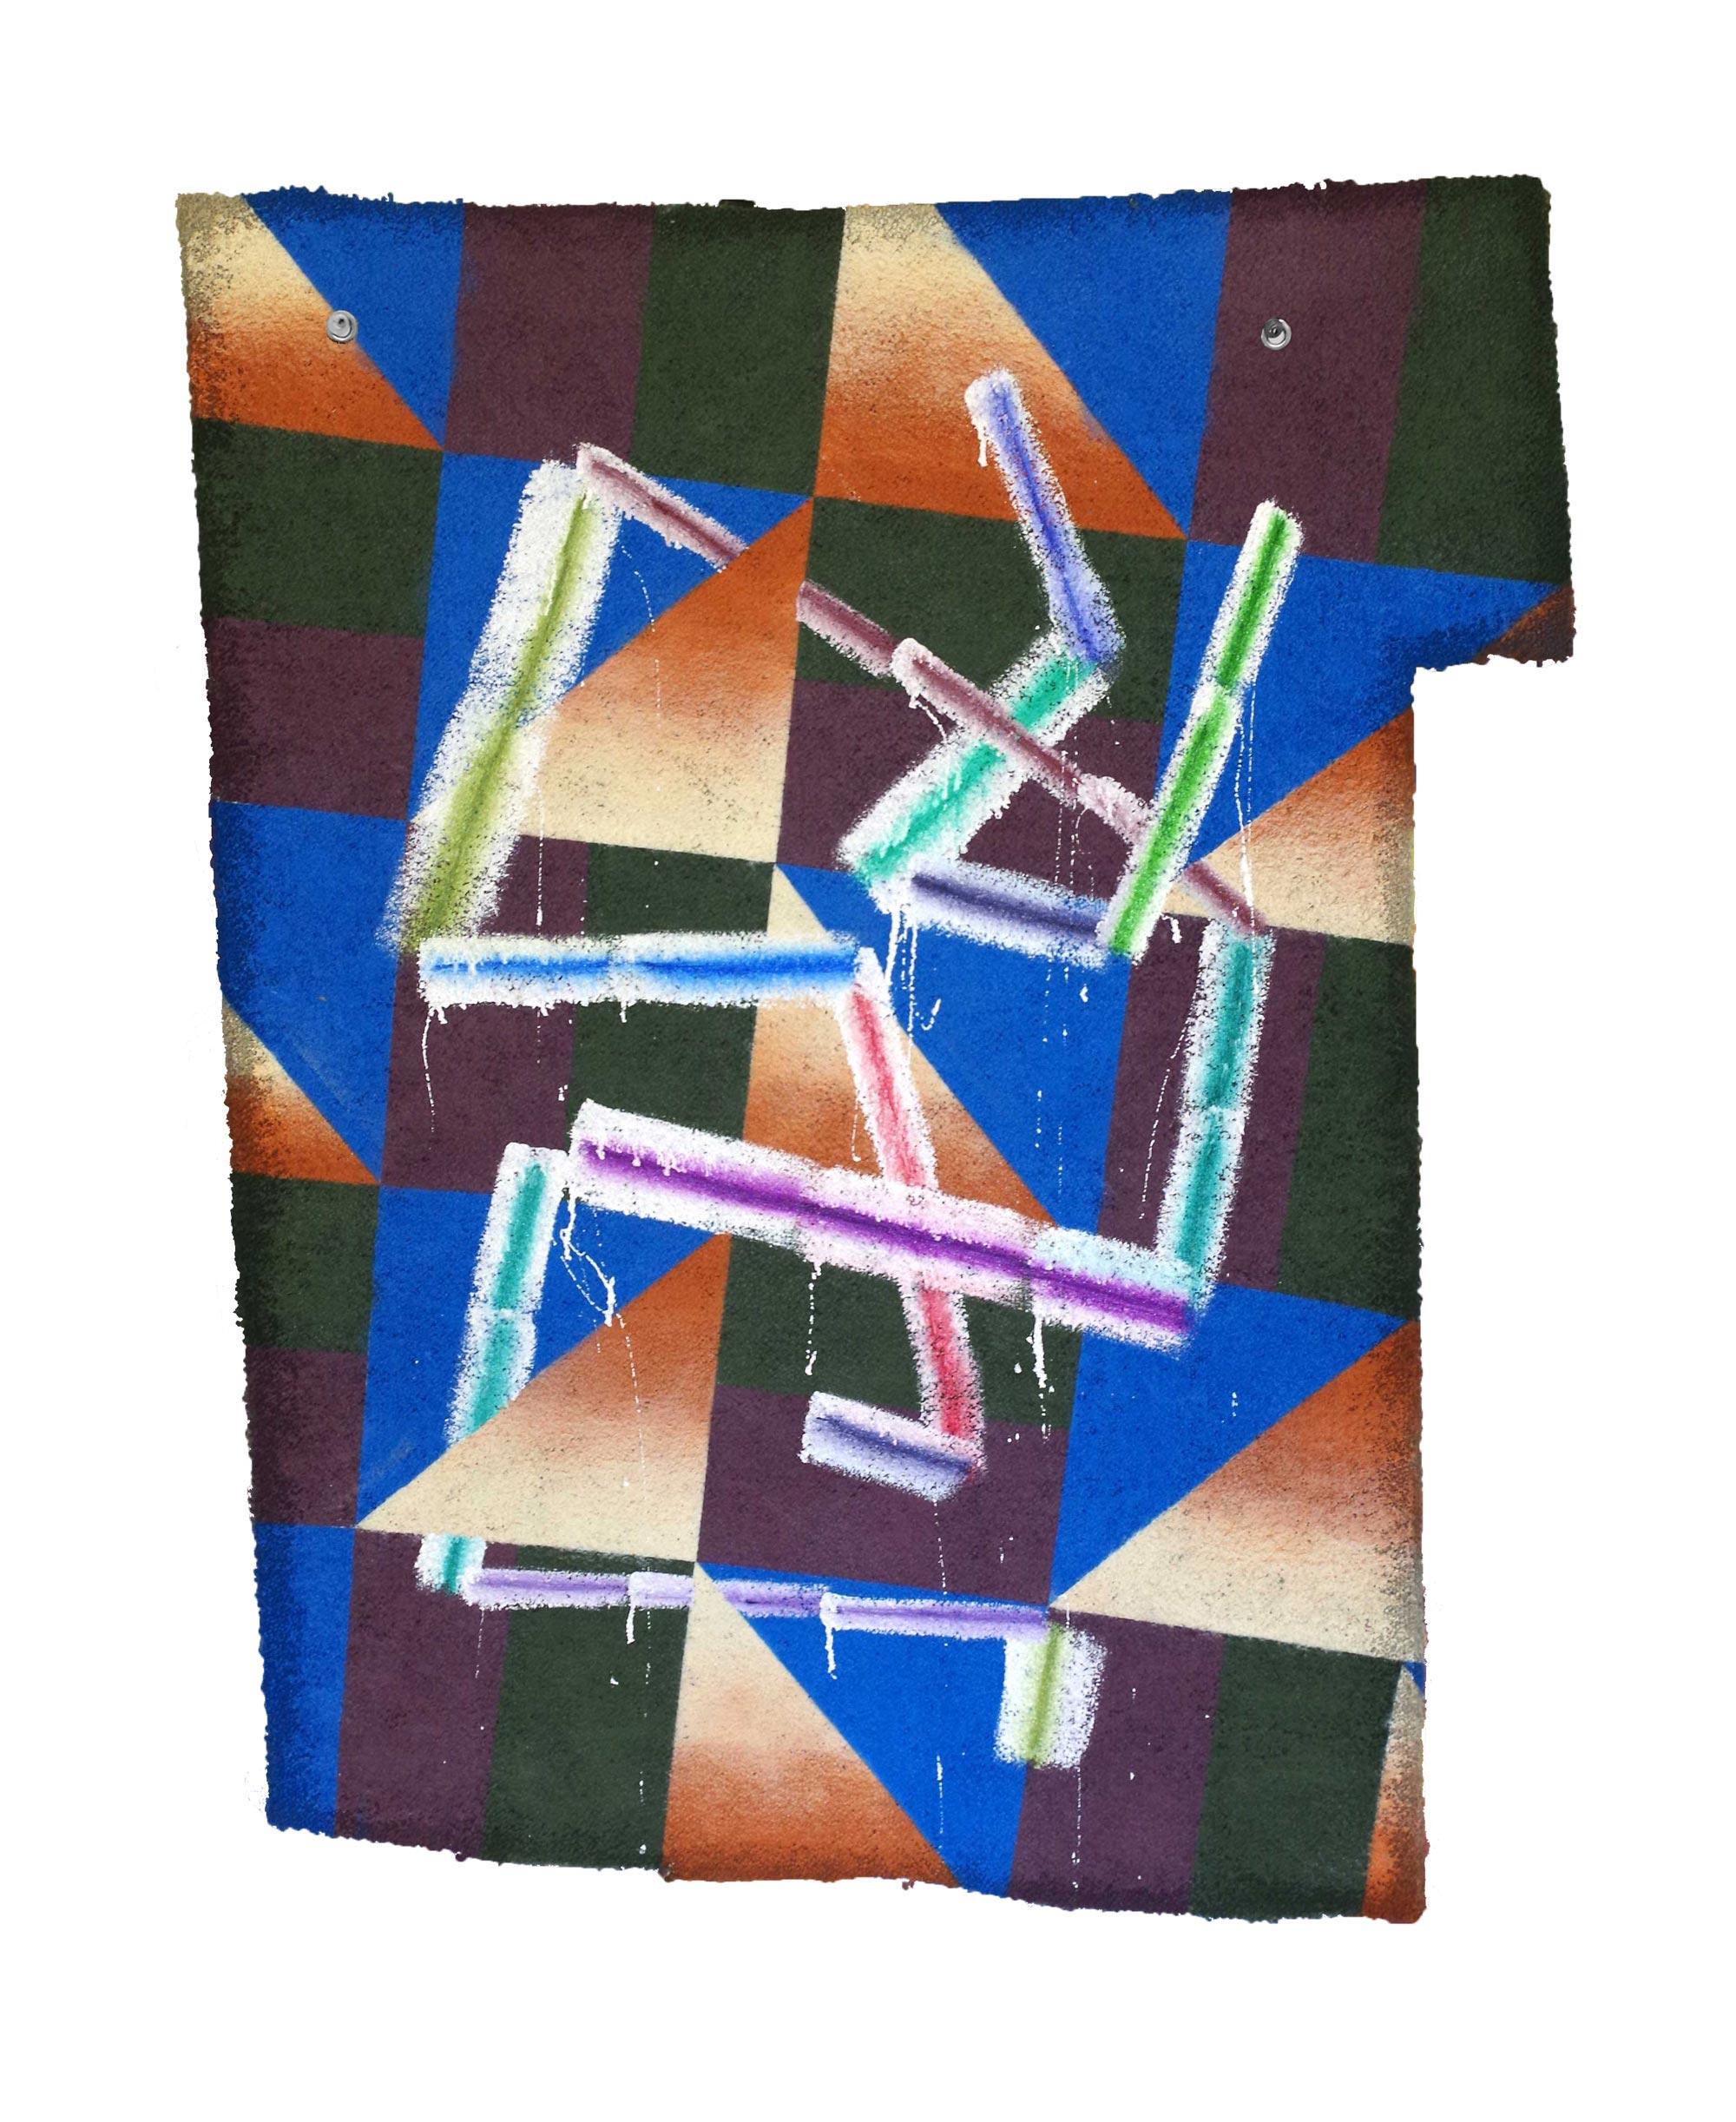 C.W.C.W. (2016)   Oil, Enamel & Spray Paint on Carpet